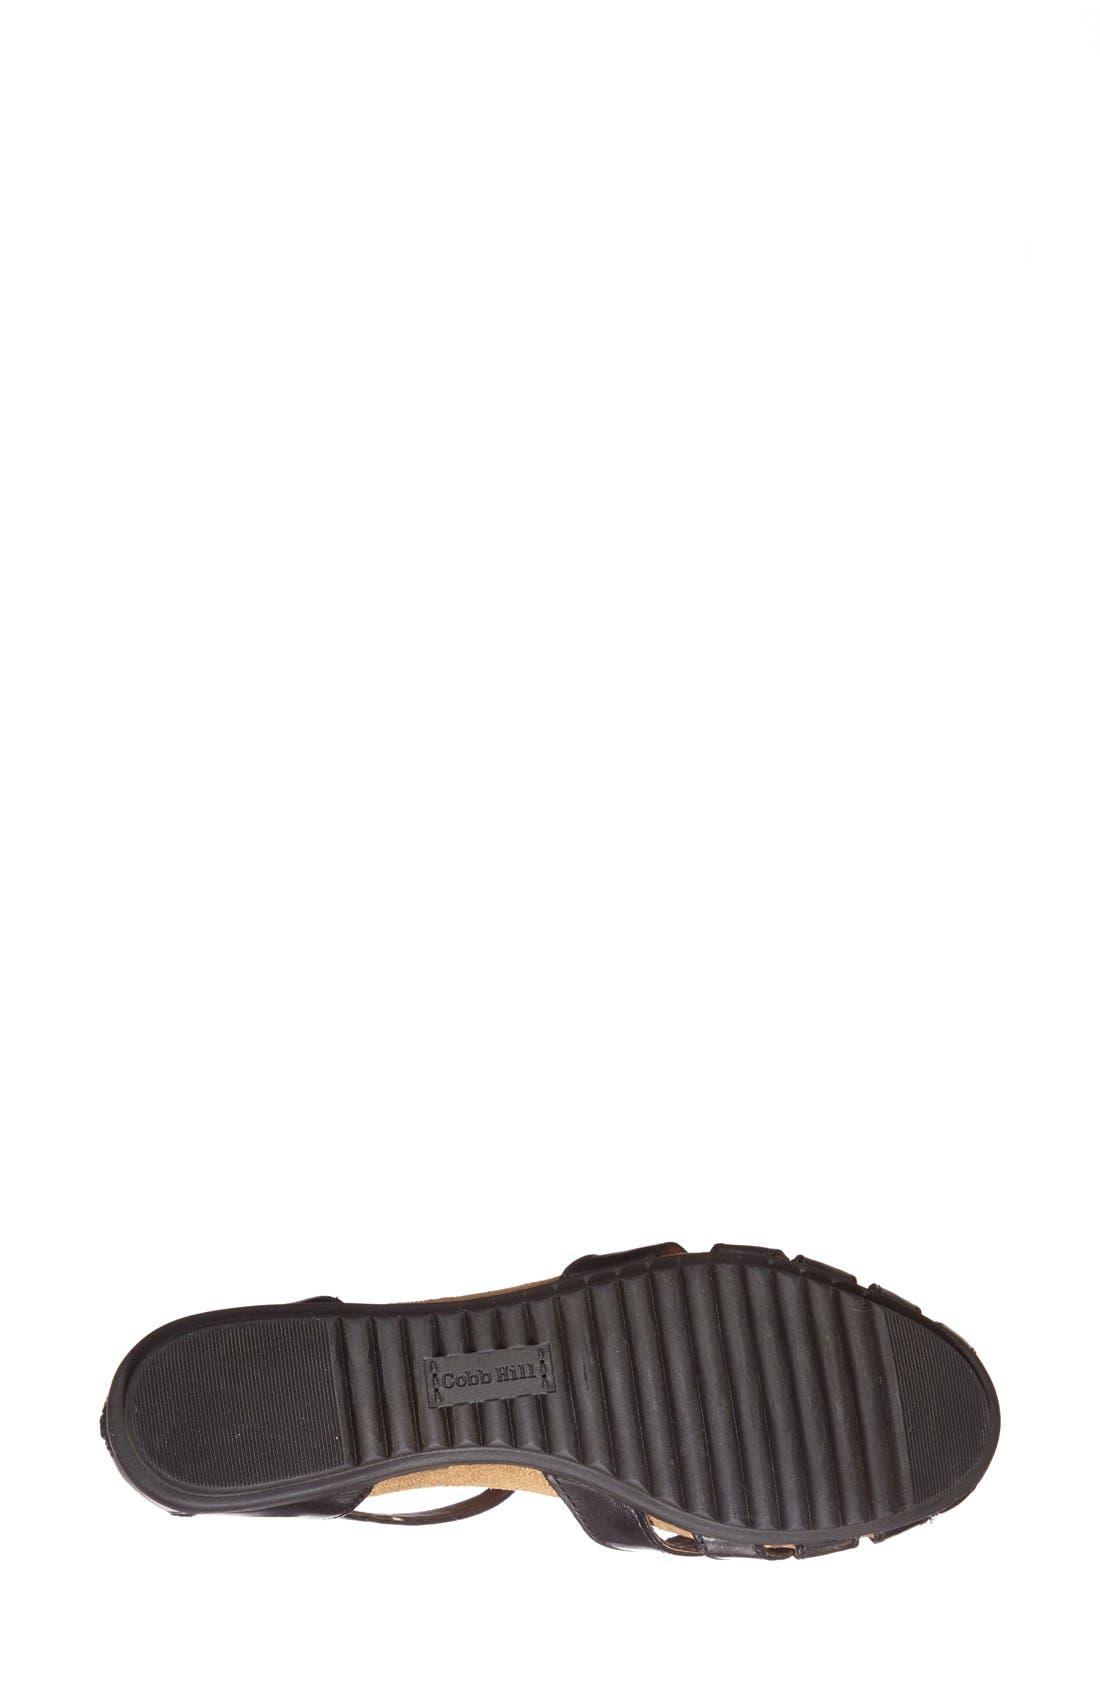 ROCKPORT COBB HILL, 'Ireland' Leather Sandal, Alternate thumbnail 5, color, BLACK